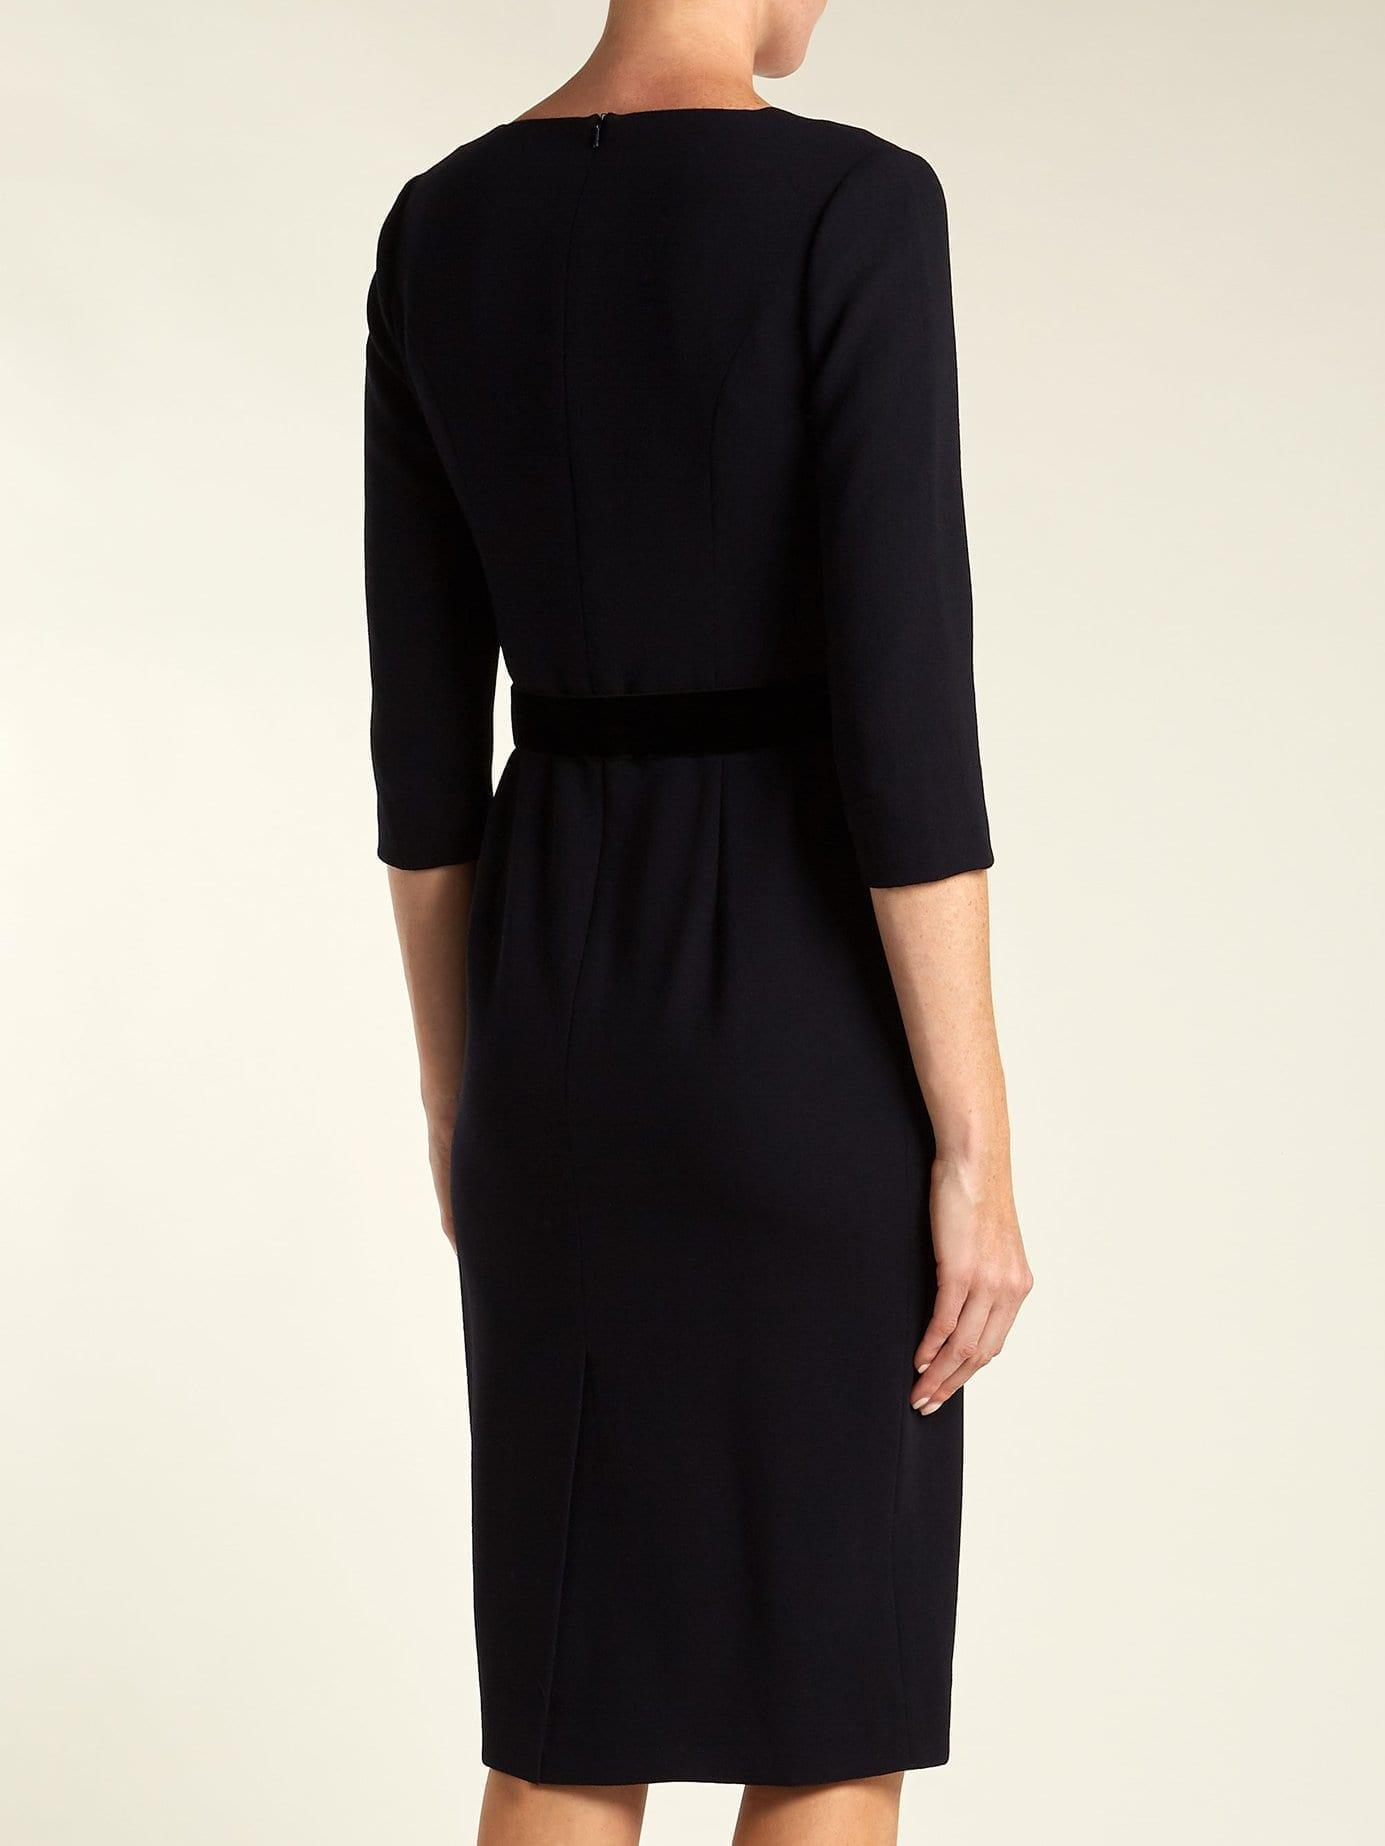 GOAT Gilda Wool Crepe Navy Dress